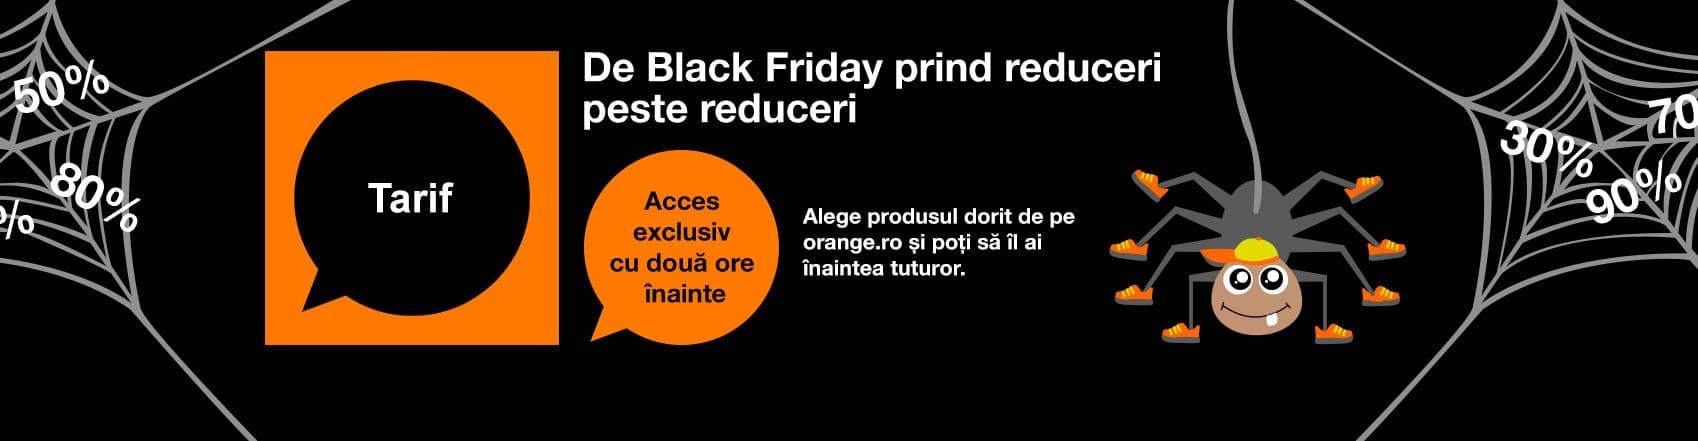 Orange demarează campania Black Friday 2016